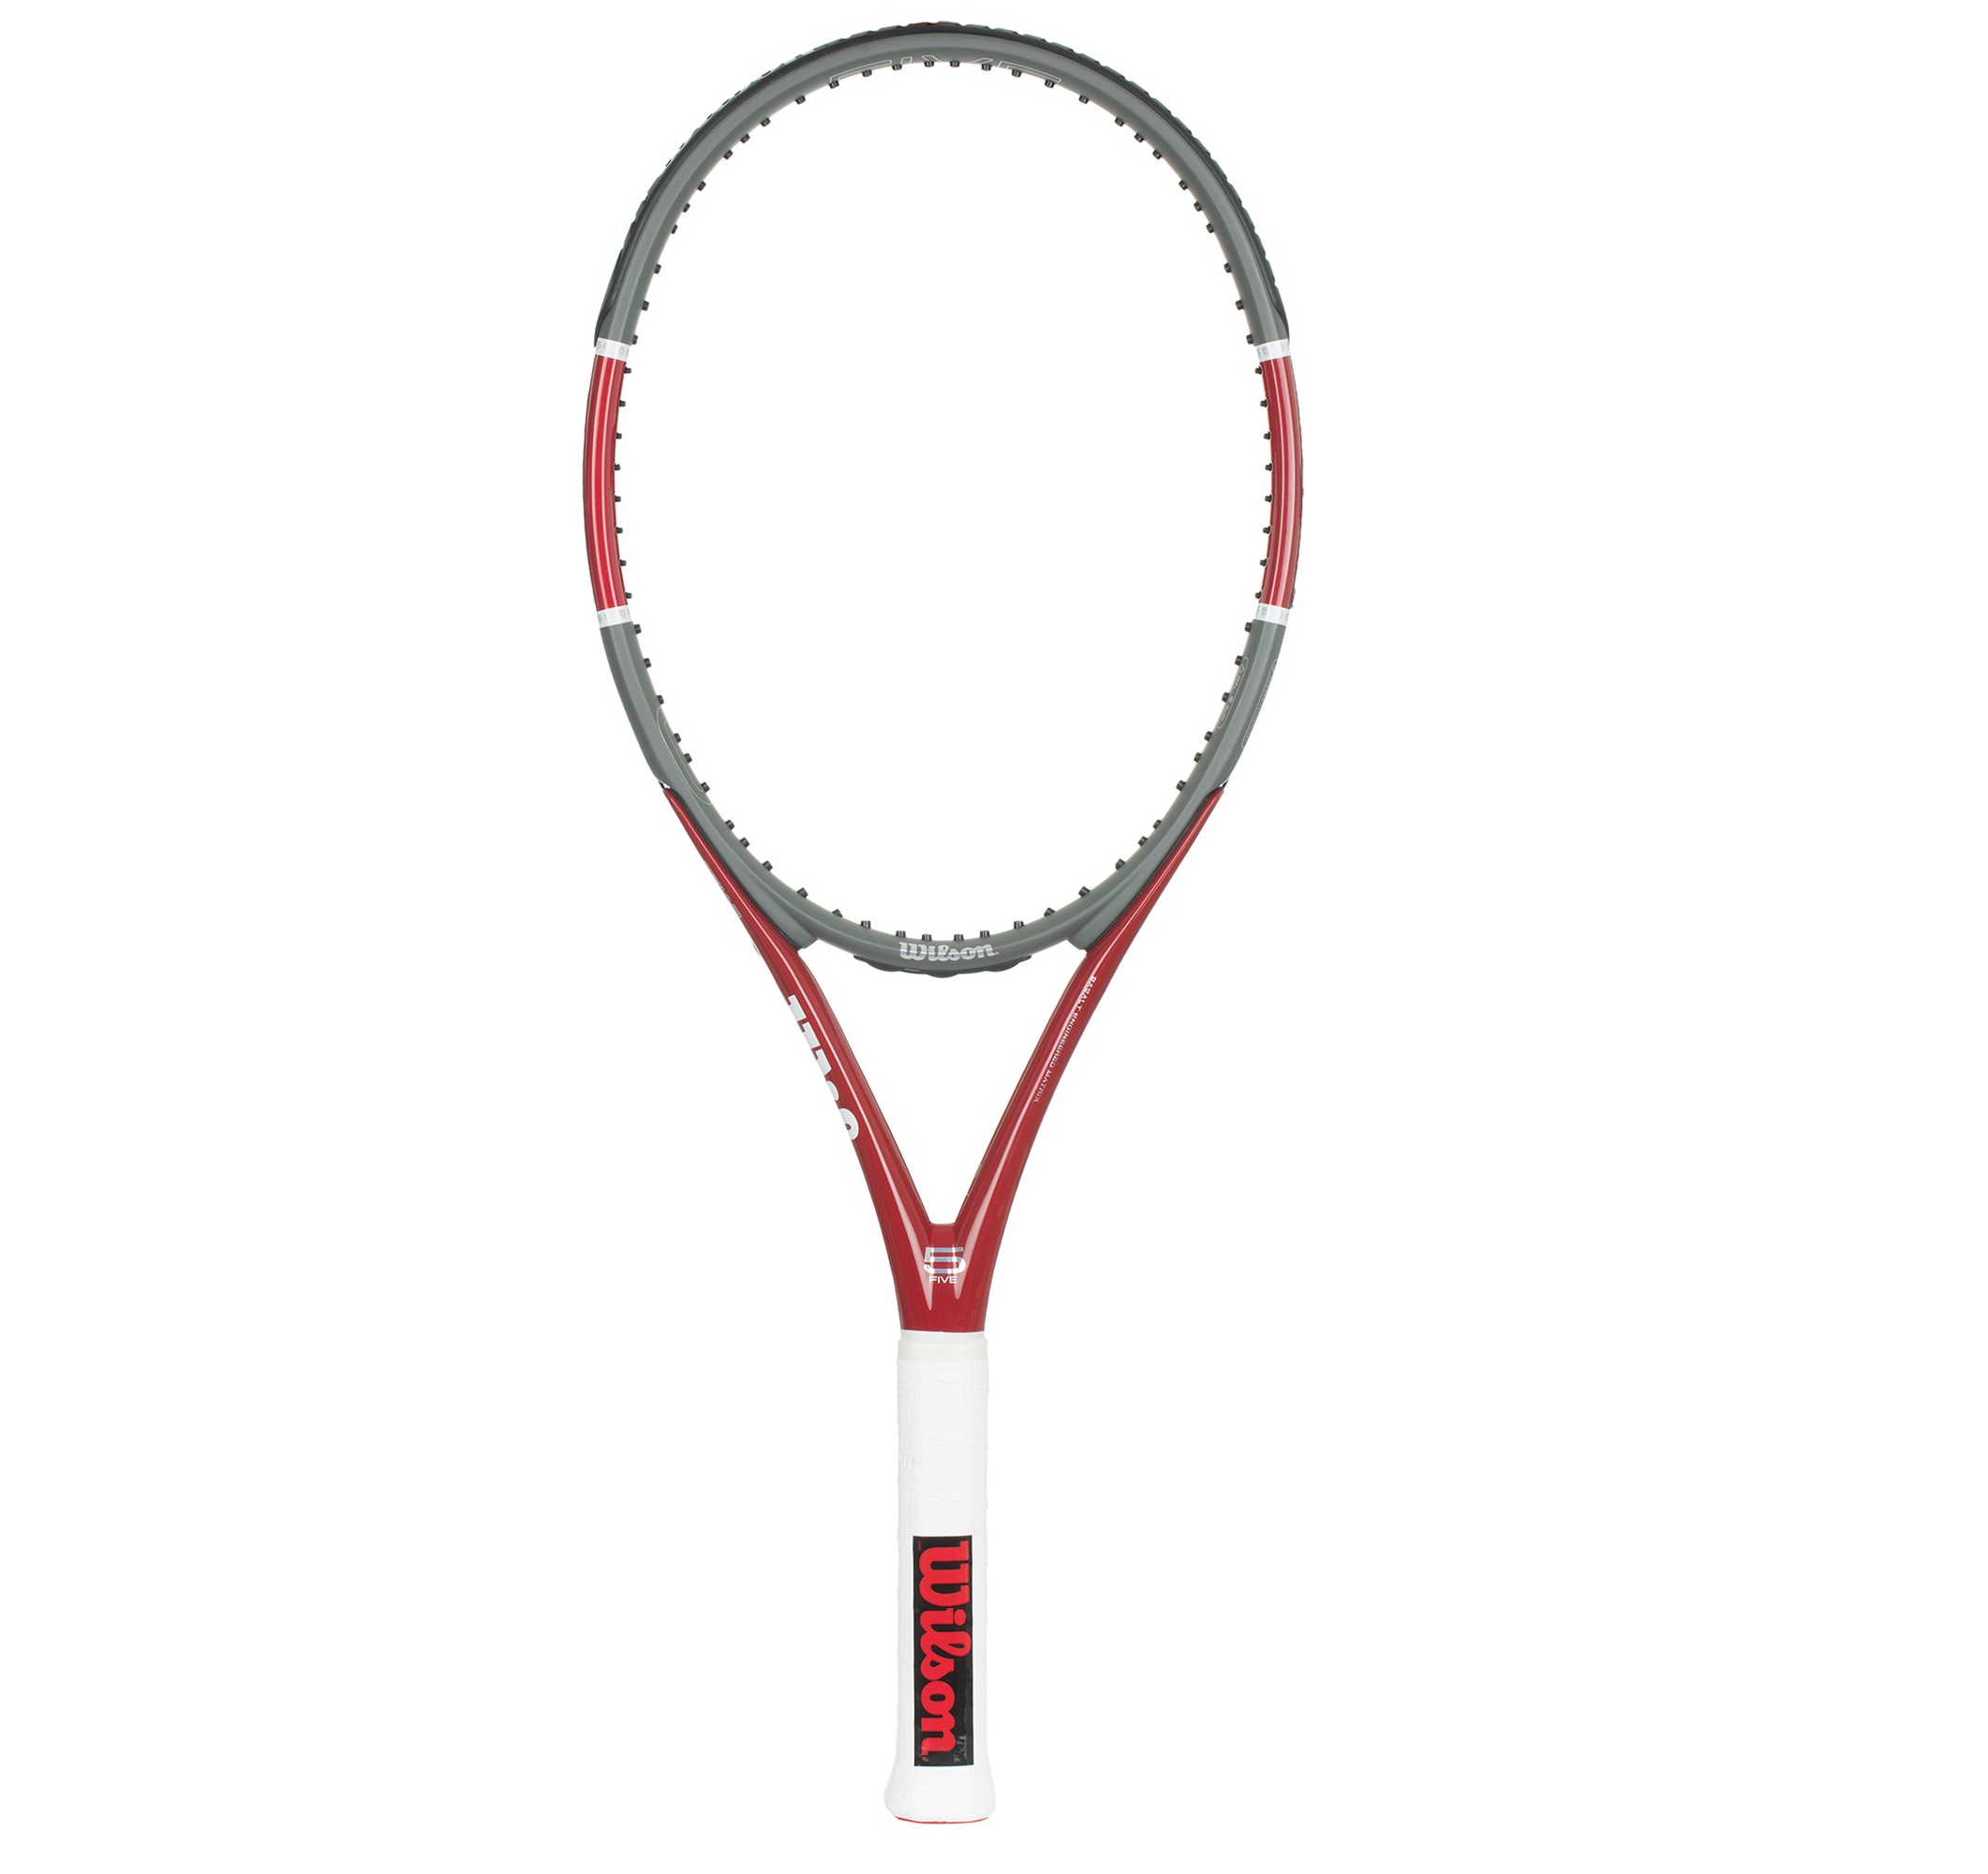 Wilson Ракетка для большого тенниса Wilson Triad Five, размер 3 wilson набор мячей для большого тенниса wilson us open x3 размер без размера